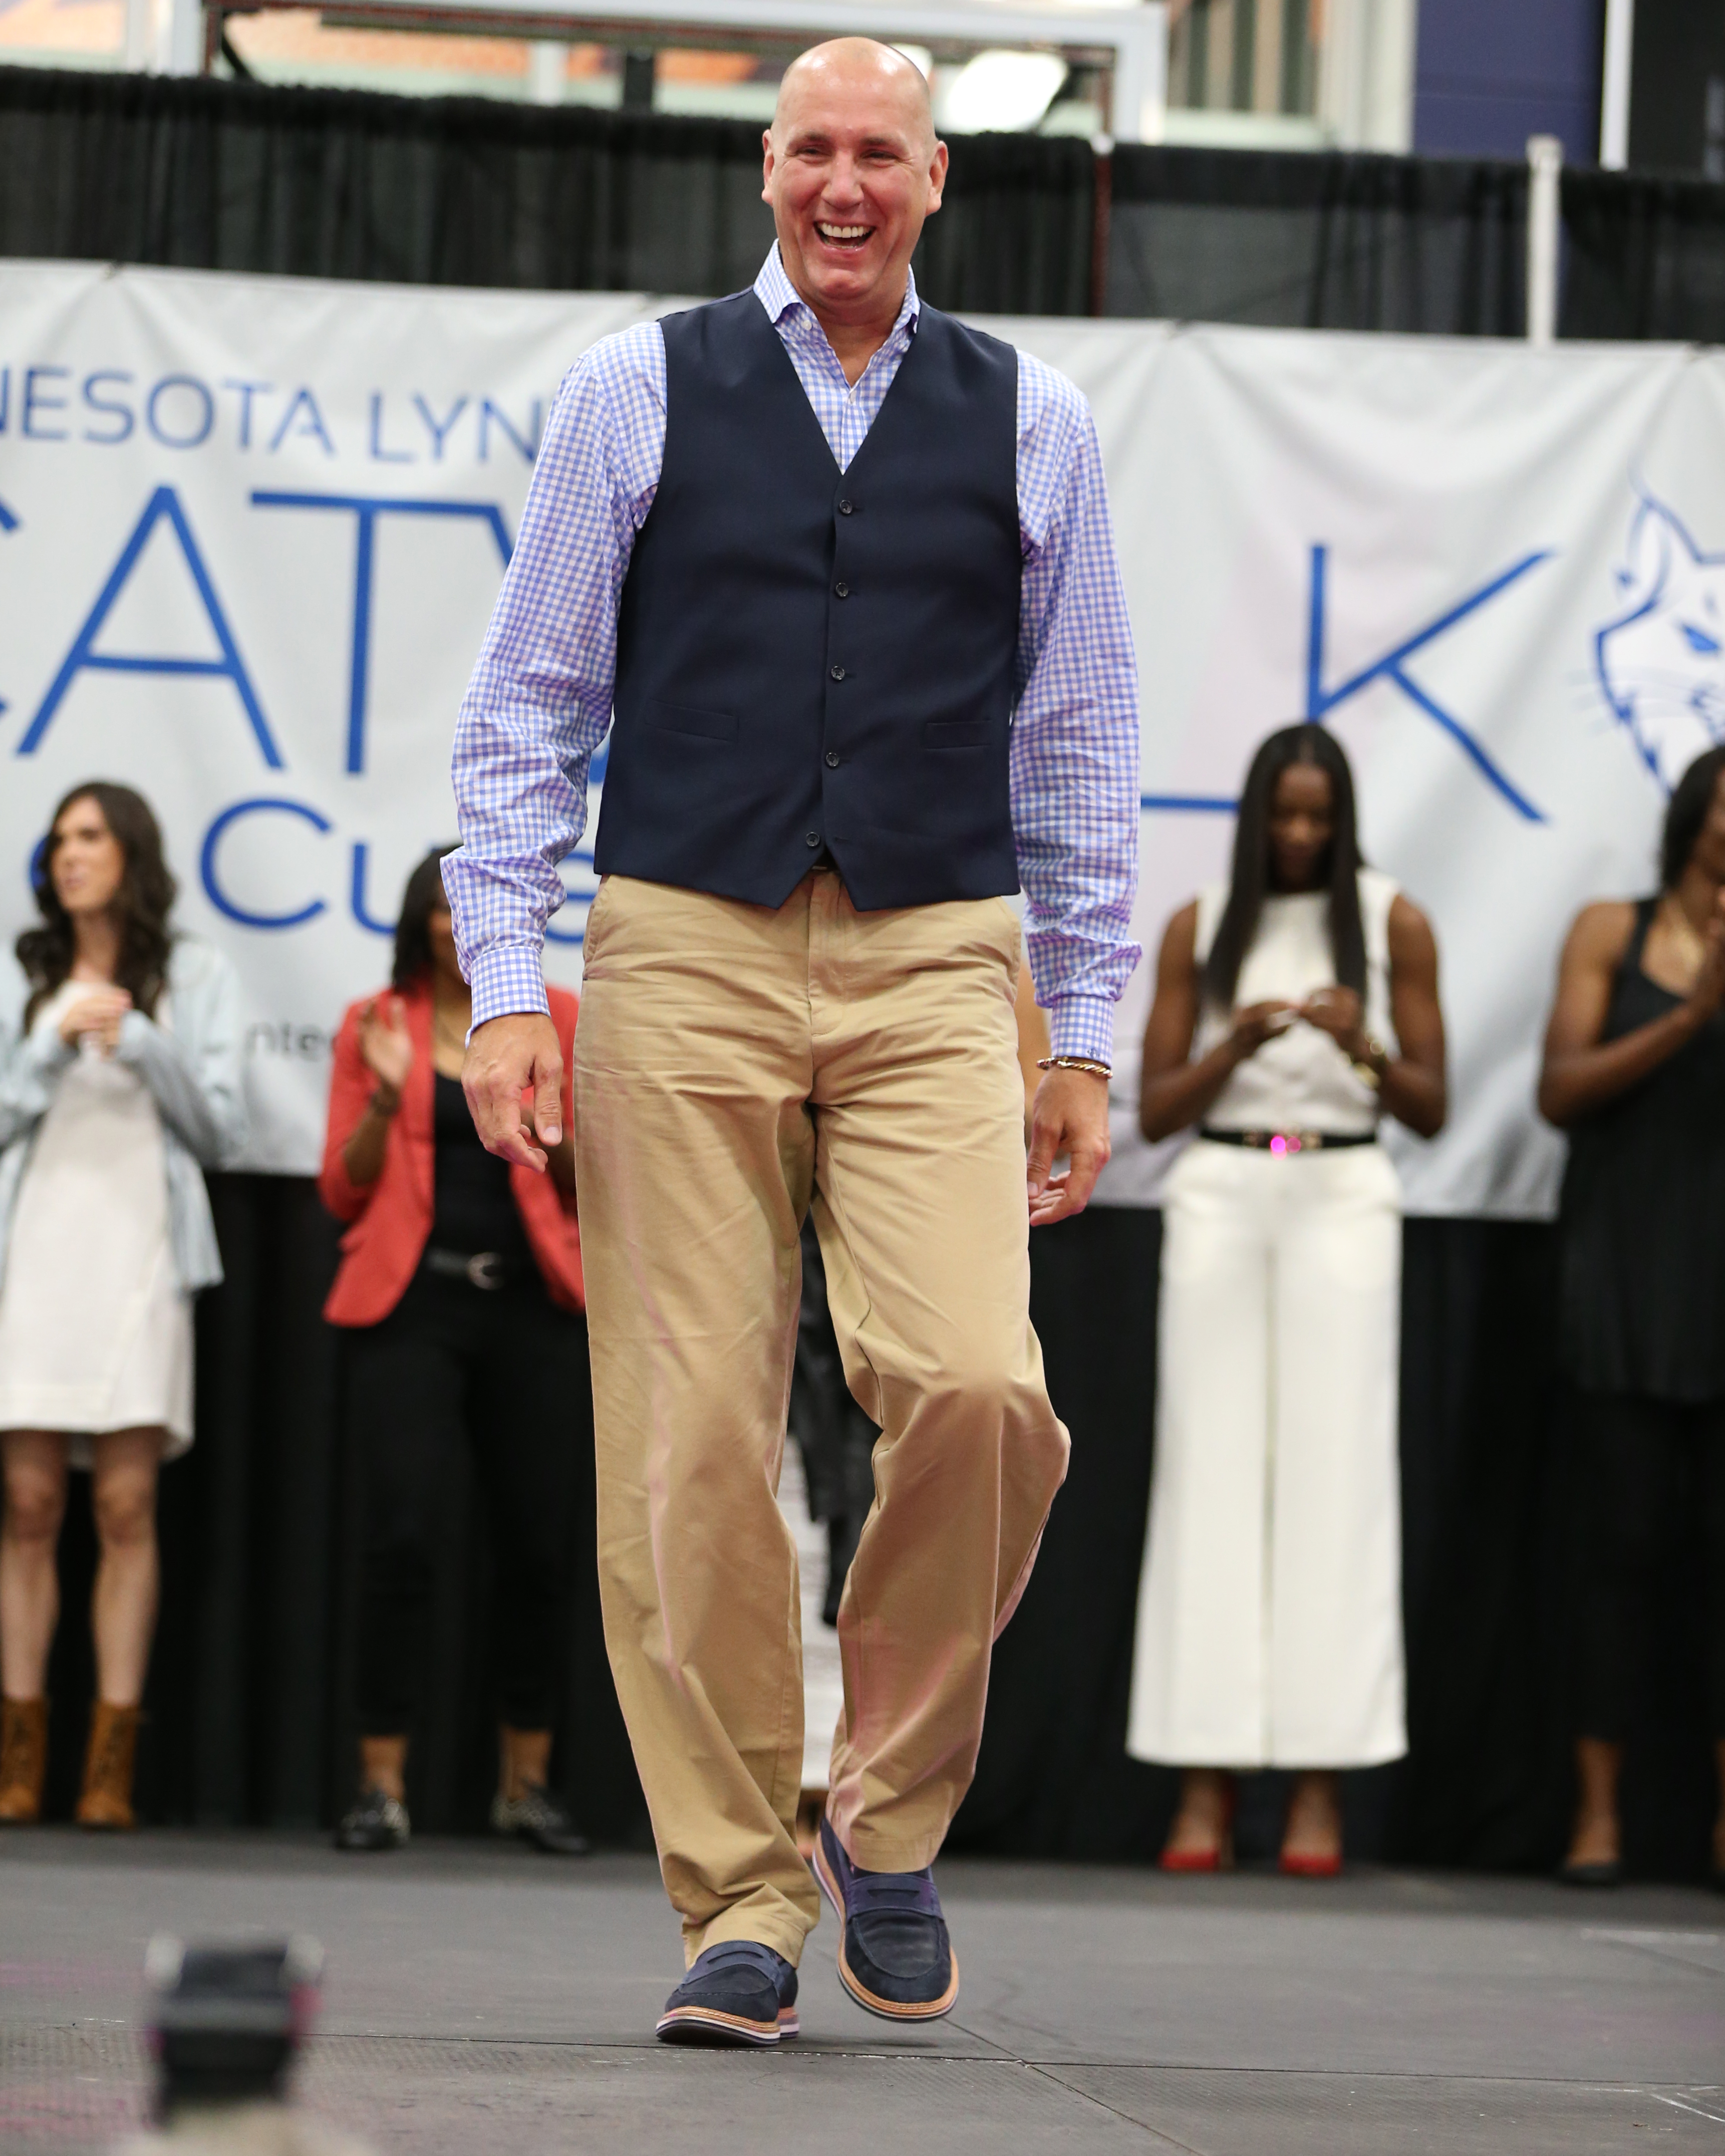 Lynx assistant coach Jim Petersen